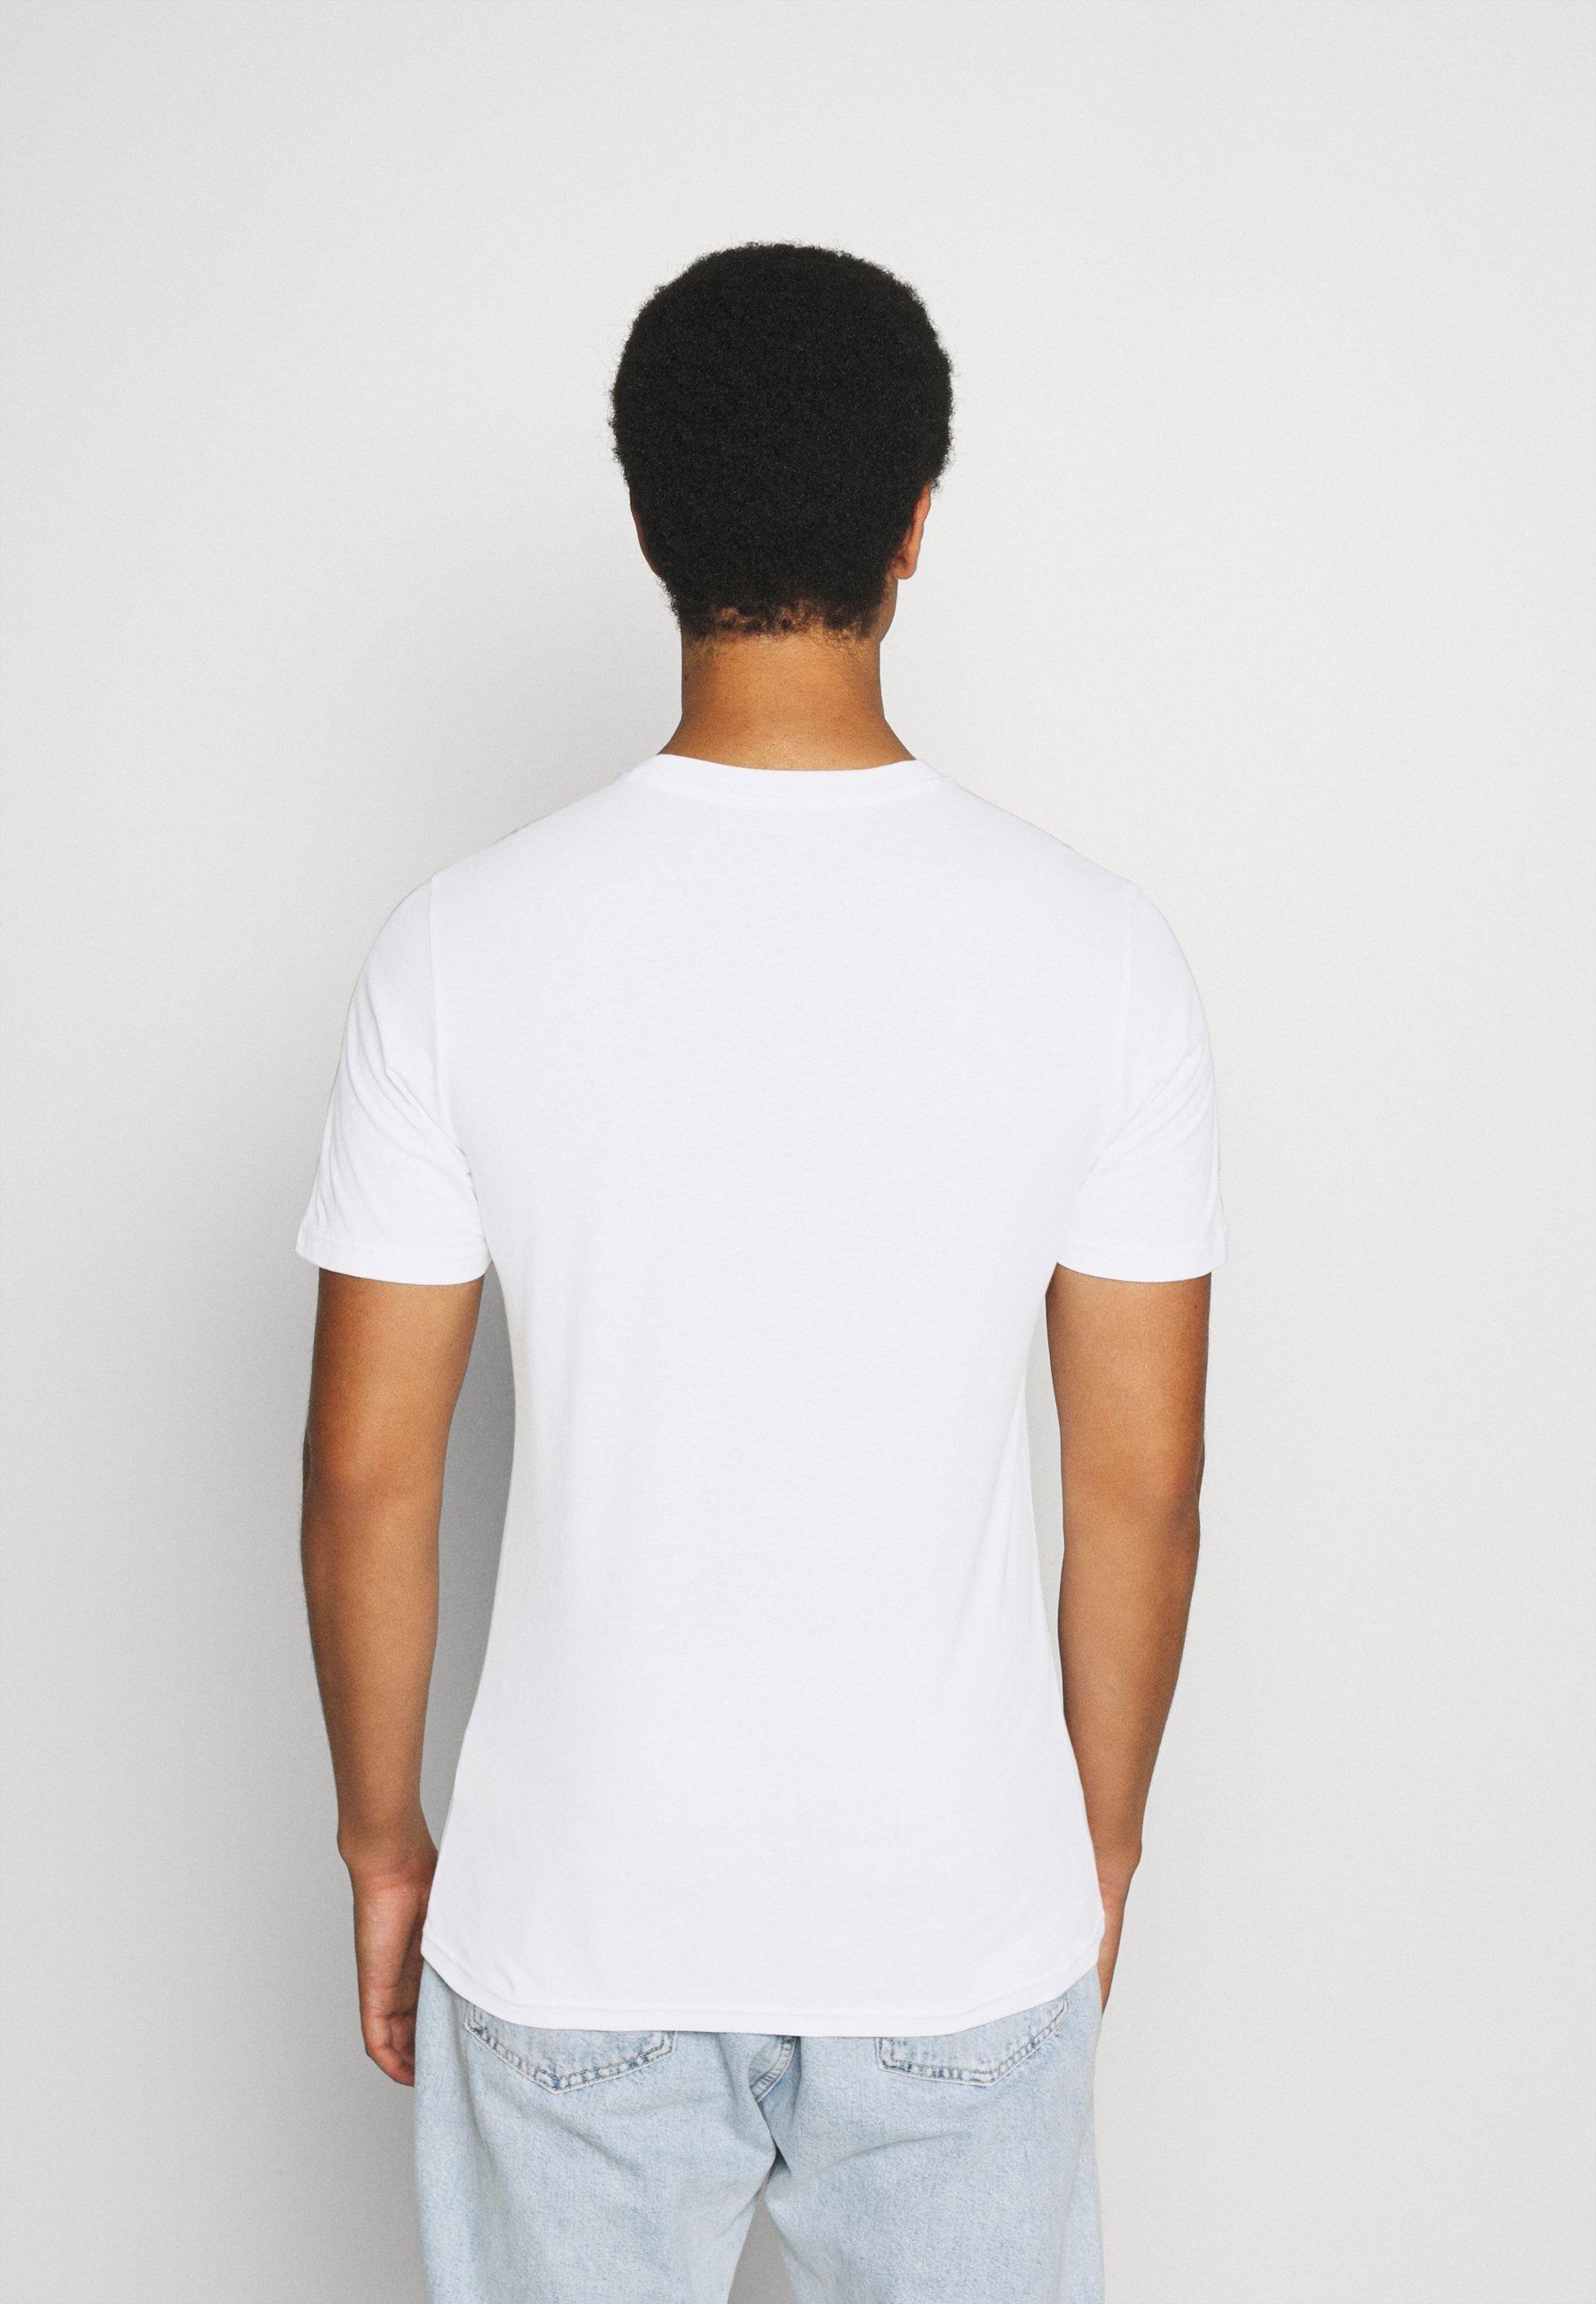 Lee TONAL FLOCK LOGO TEE - Print T-shirt - white Y80l3